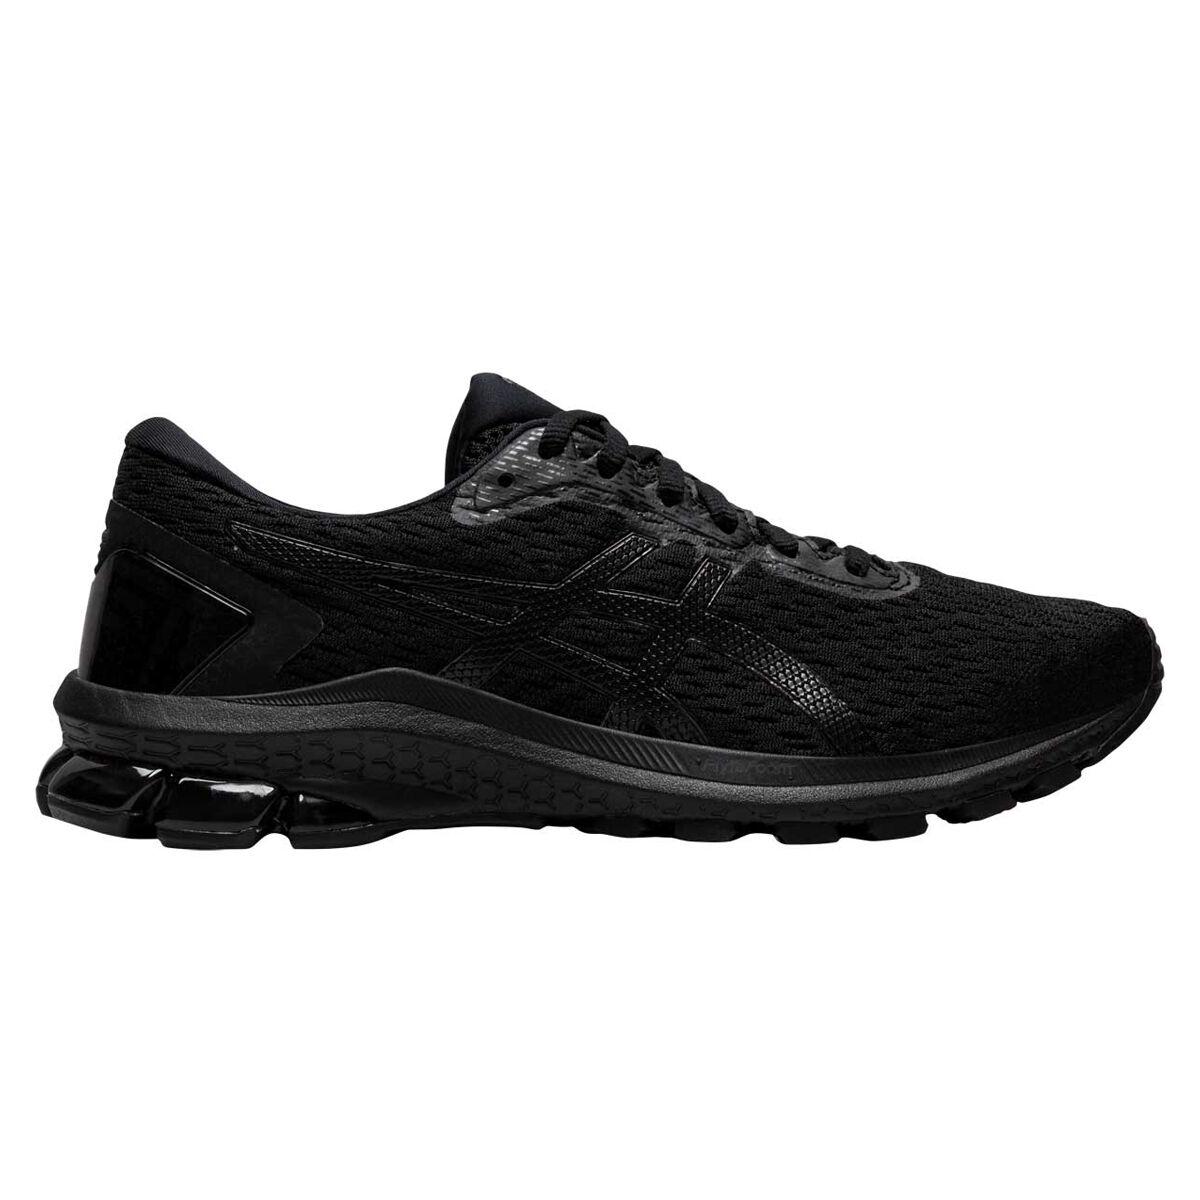 ladies black asics running shoes